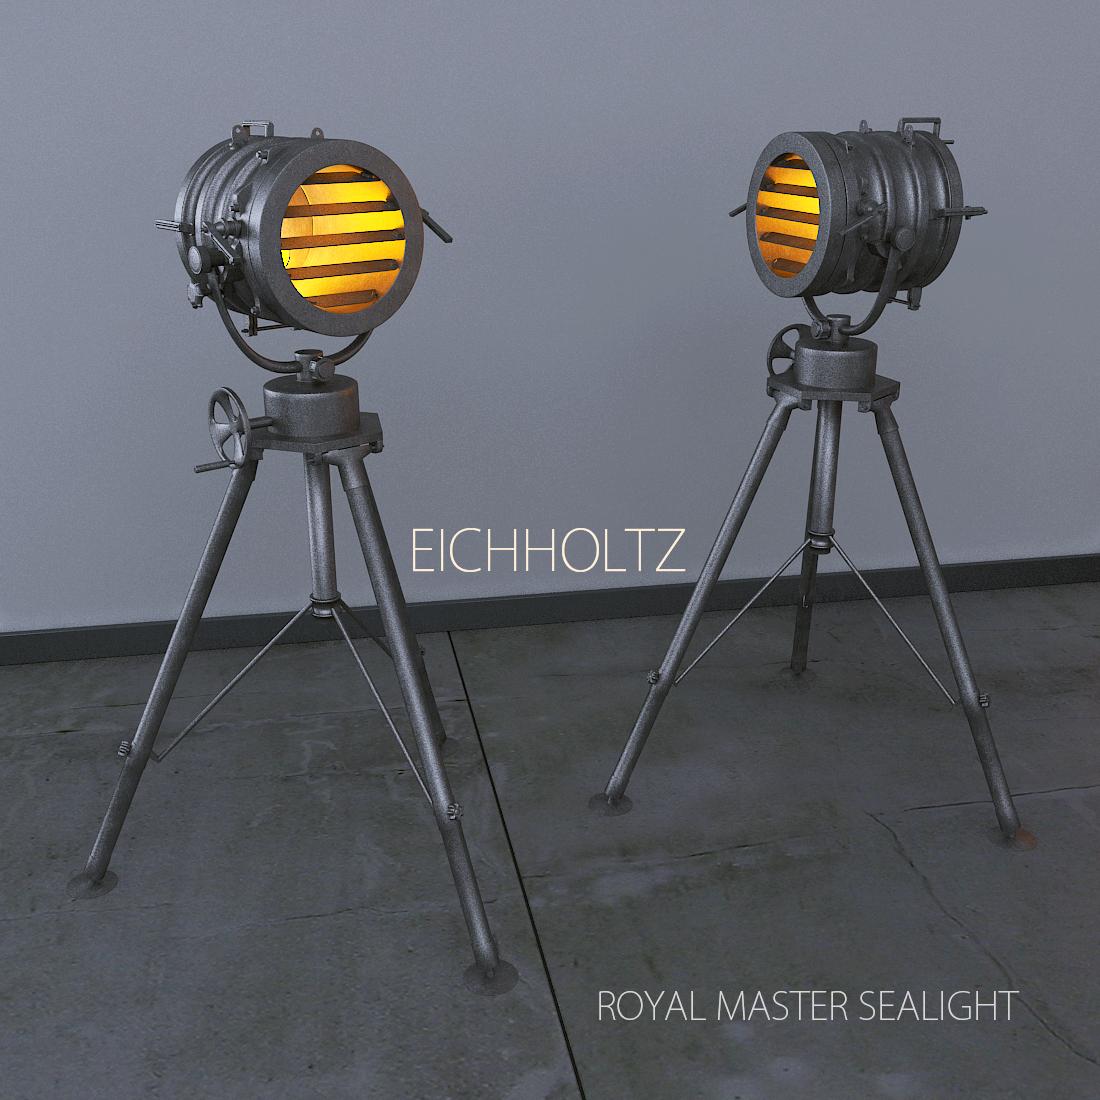 Royal master sealight floor lamp - Royal Master Sealight Eichholtz 3docean Item For Sale Eichholtz1 1 Jpg